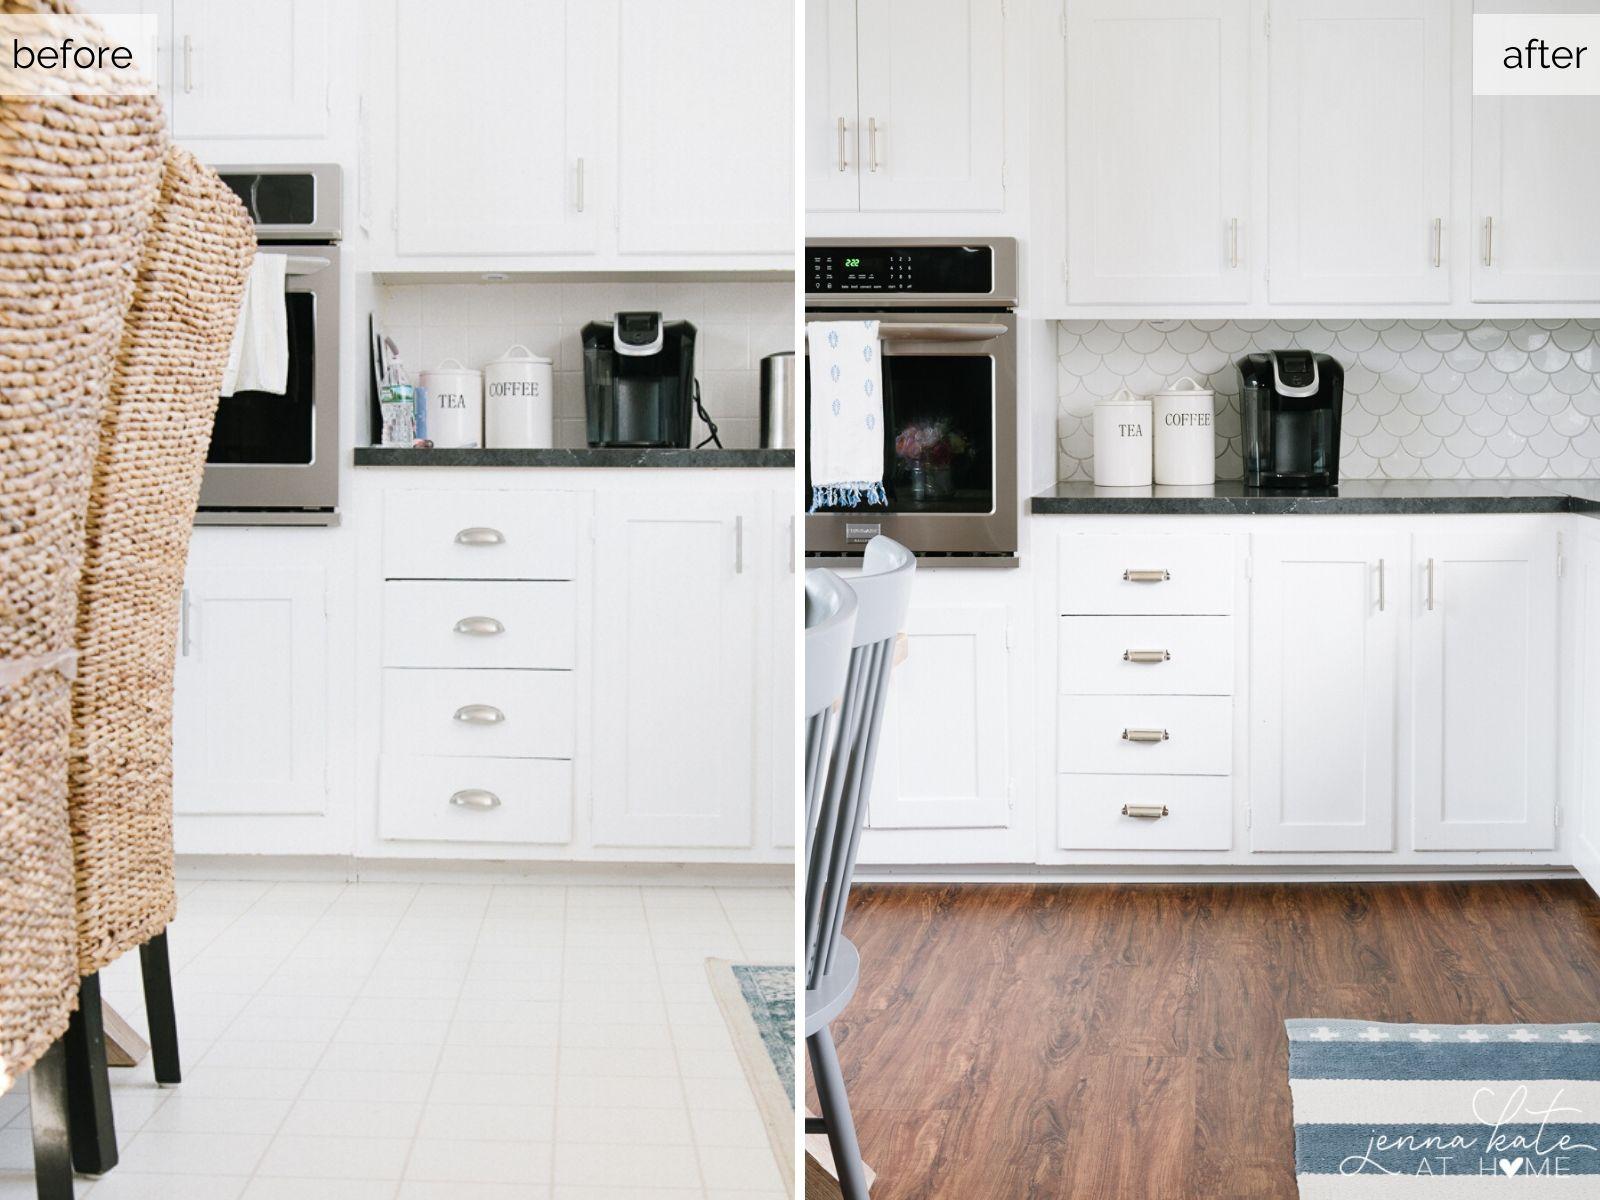 Installing luxury vinyl flooring over old linoleum improves the look of an old kitchen